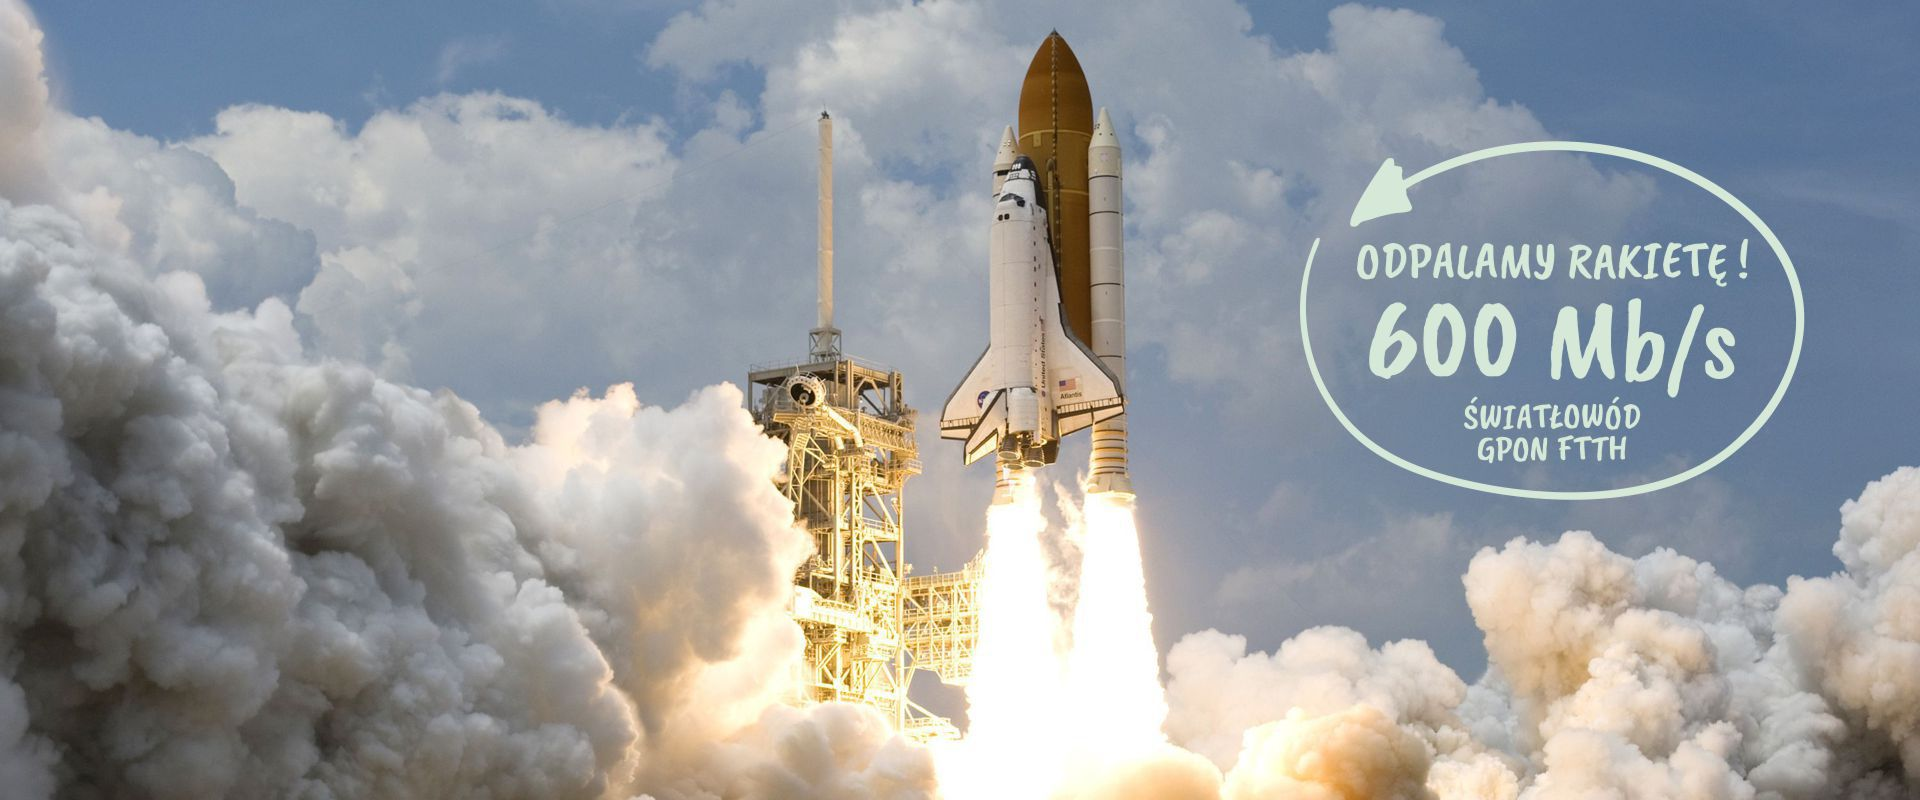 rocket-launch-1920x800_banner